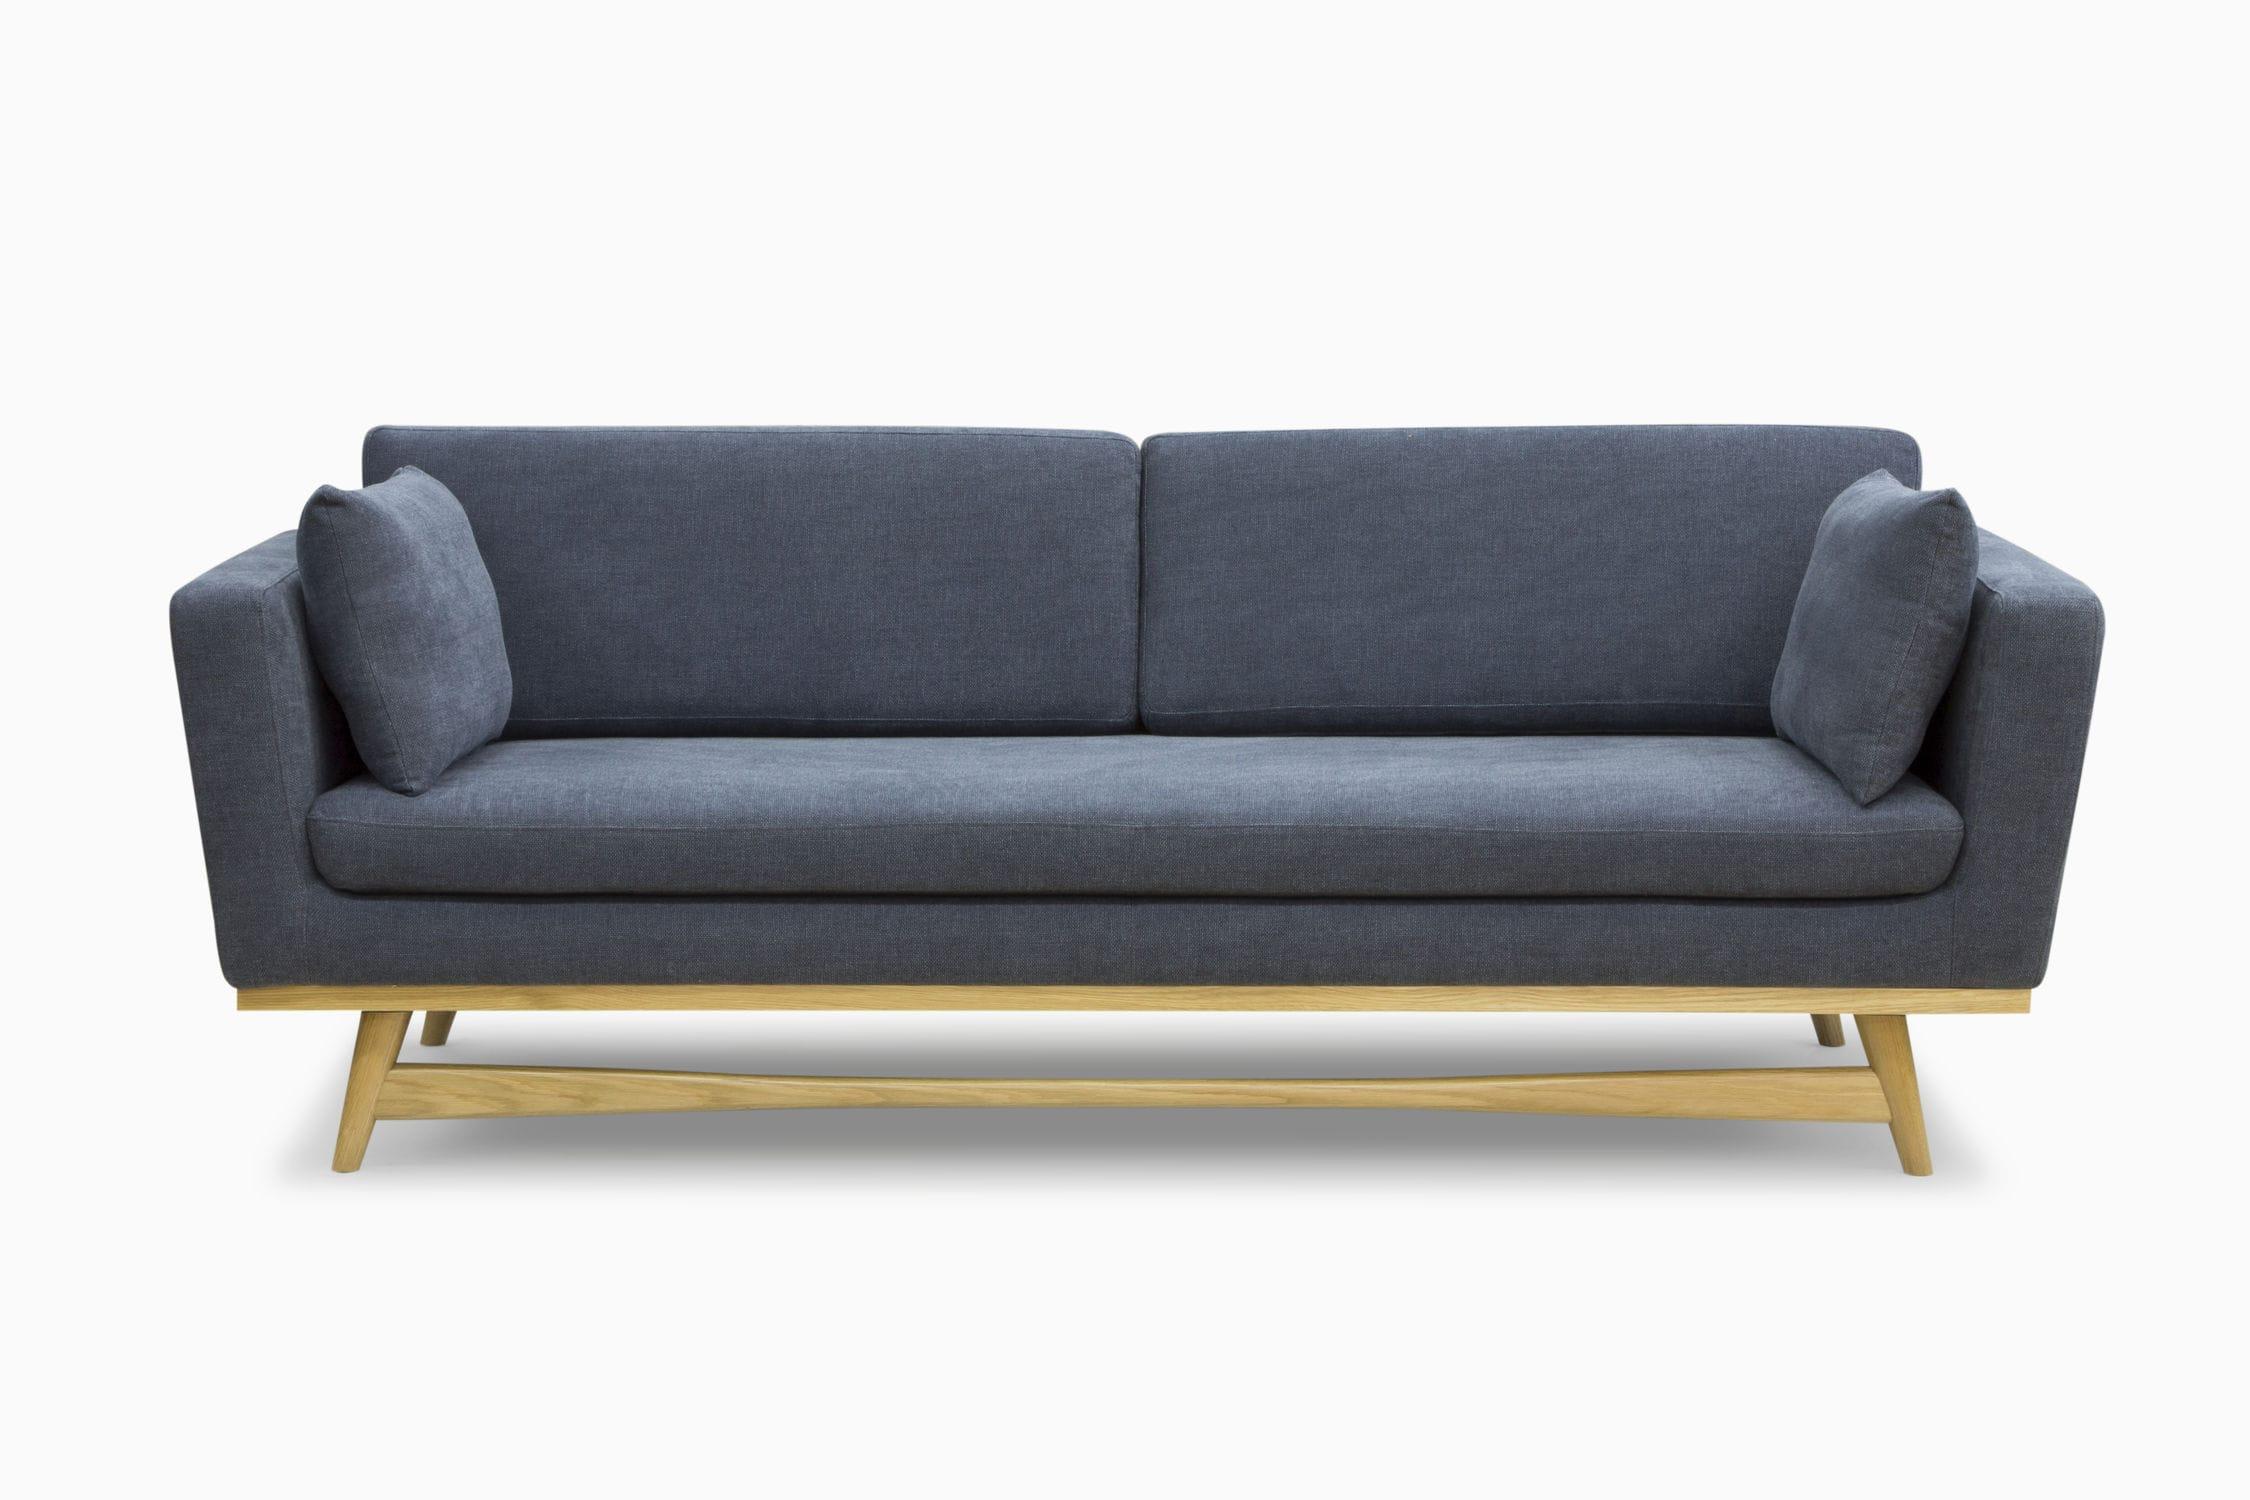 Sofa Skandinavisches Design Massivholz Stoff 3 Plätze